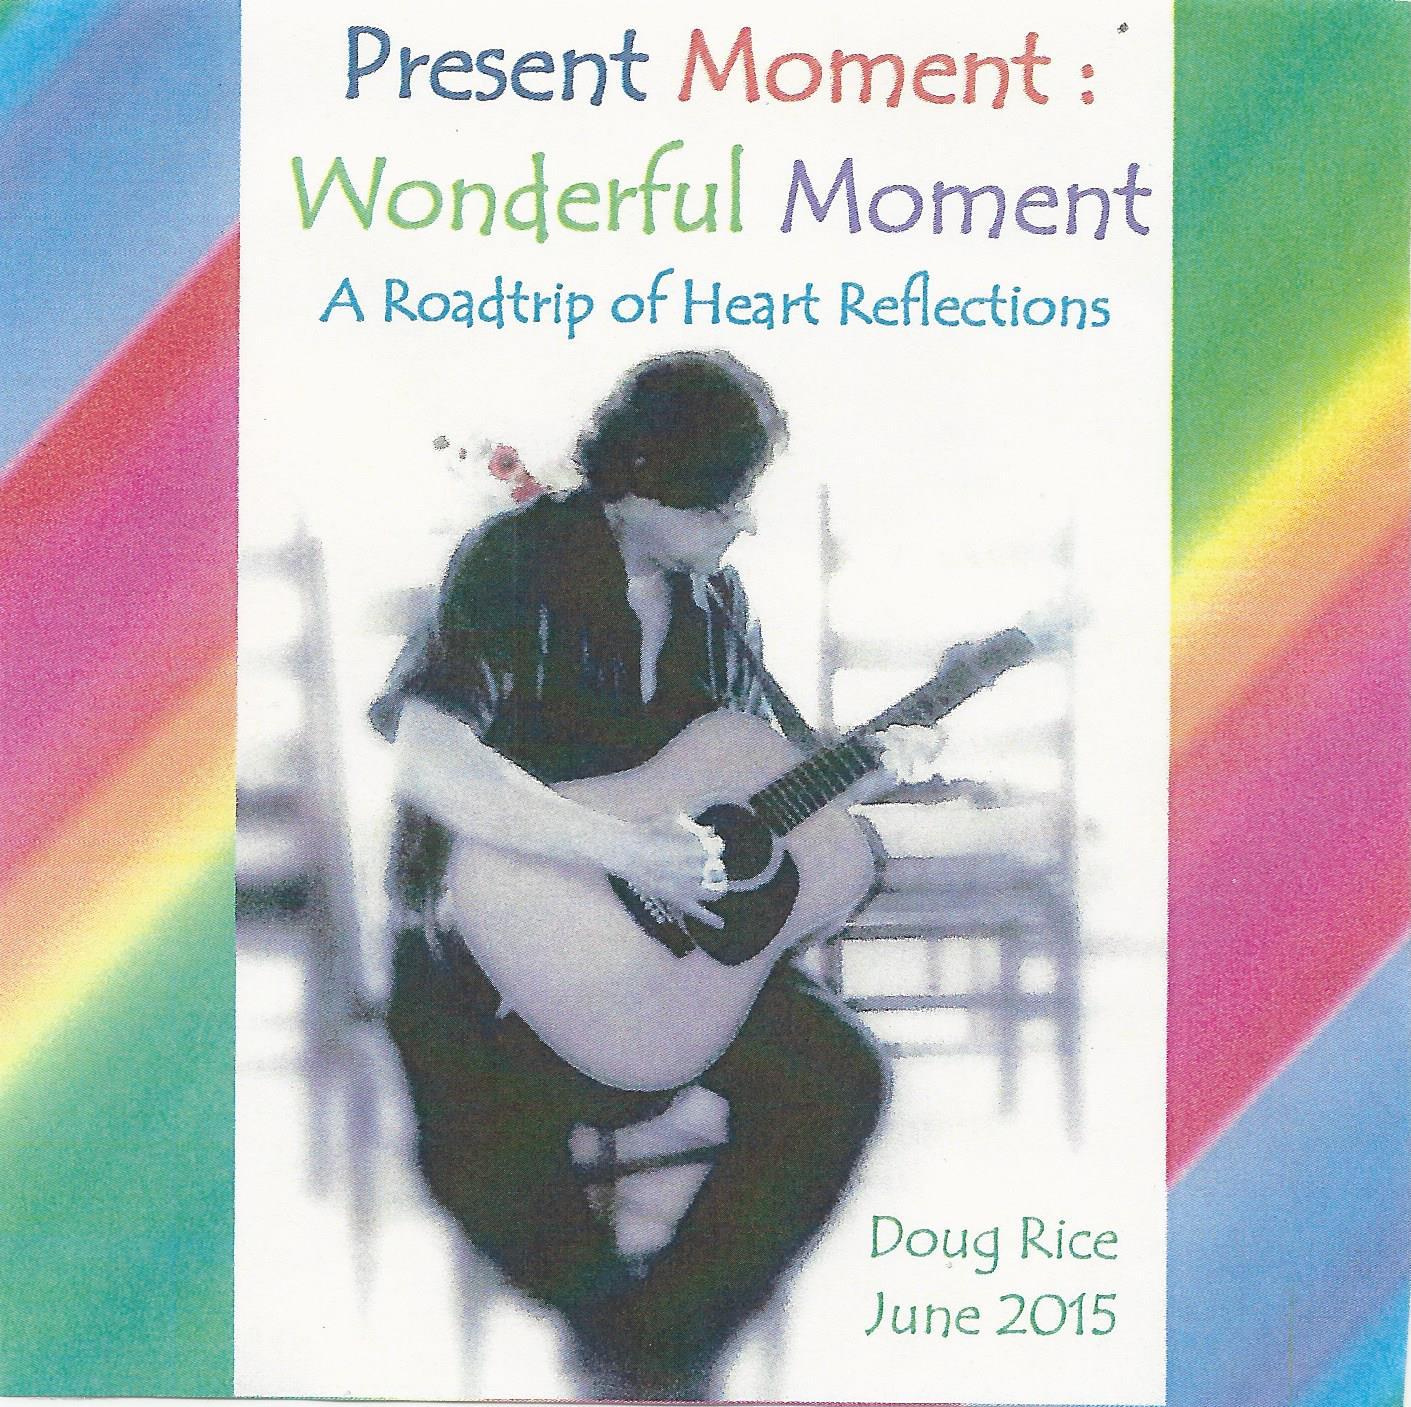 Present Moment - Wonderful Moment